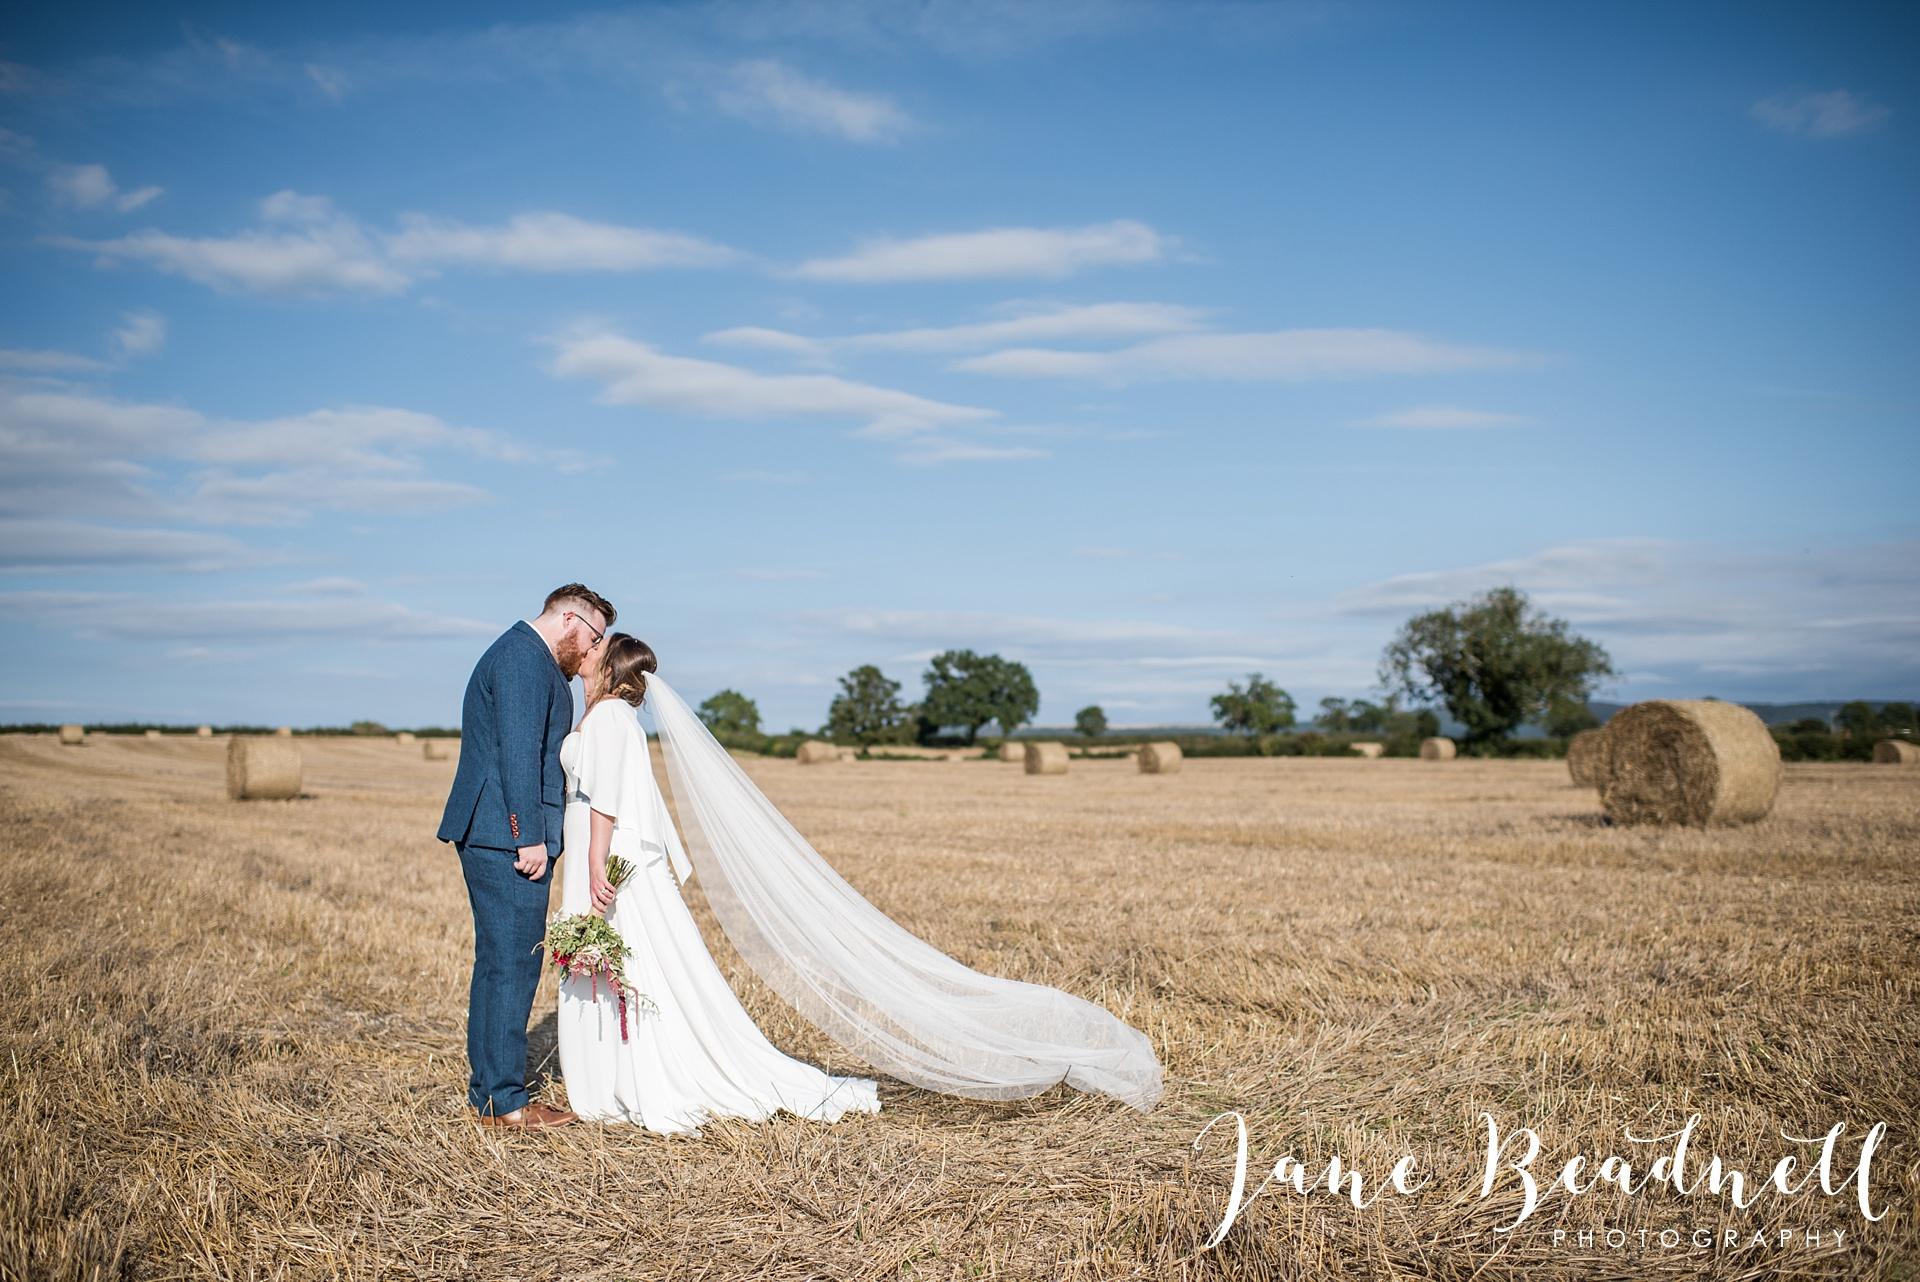 fine-art-wedding-photographer-jane-beadnell-yorkshire-wedding-photographer-garden-wedding_0064